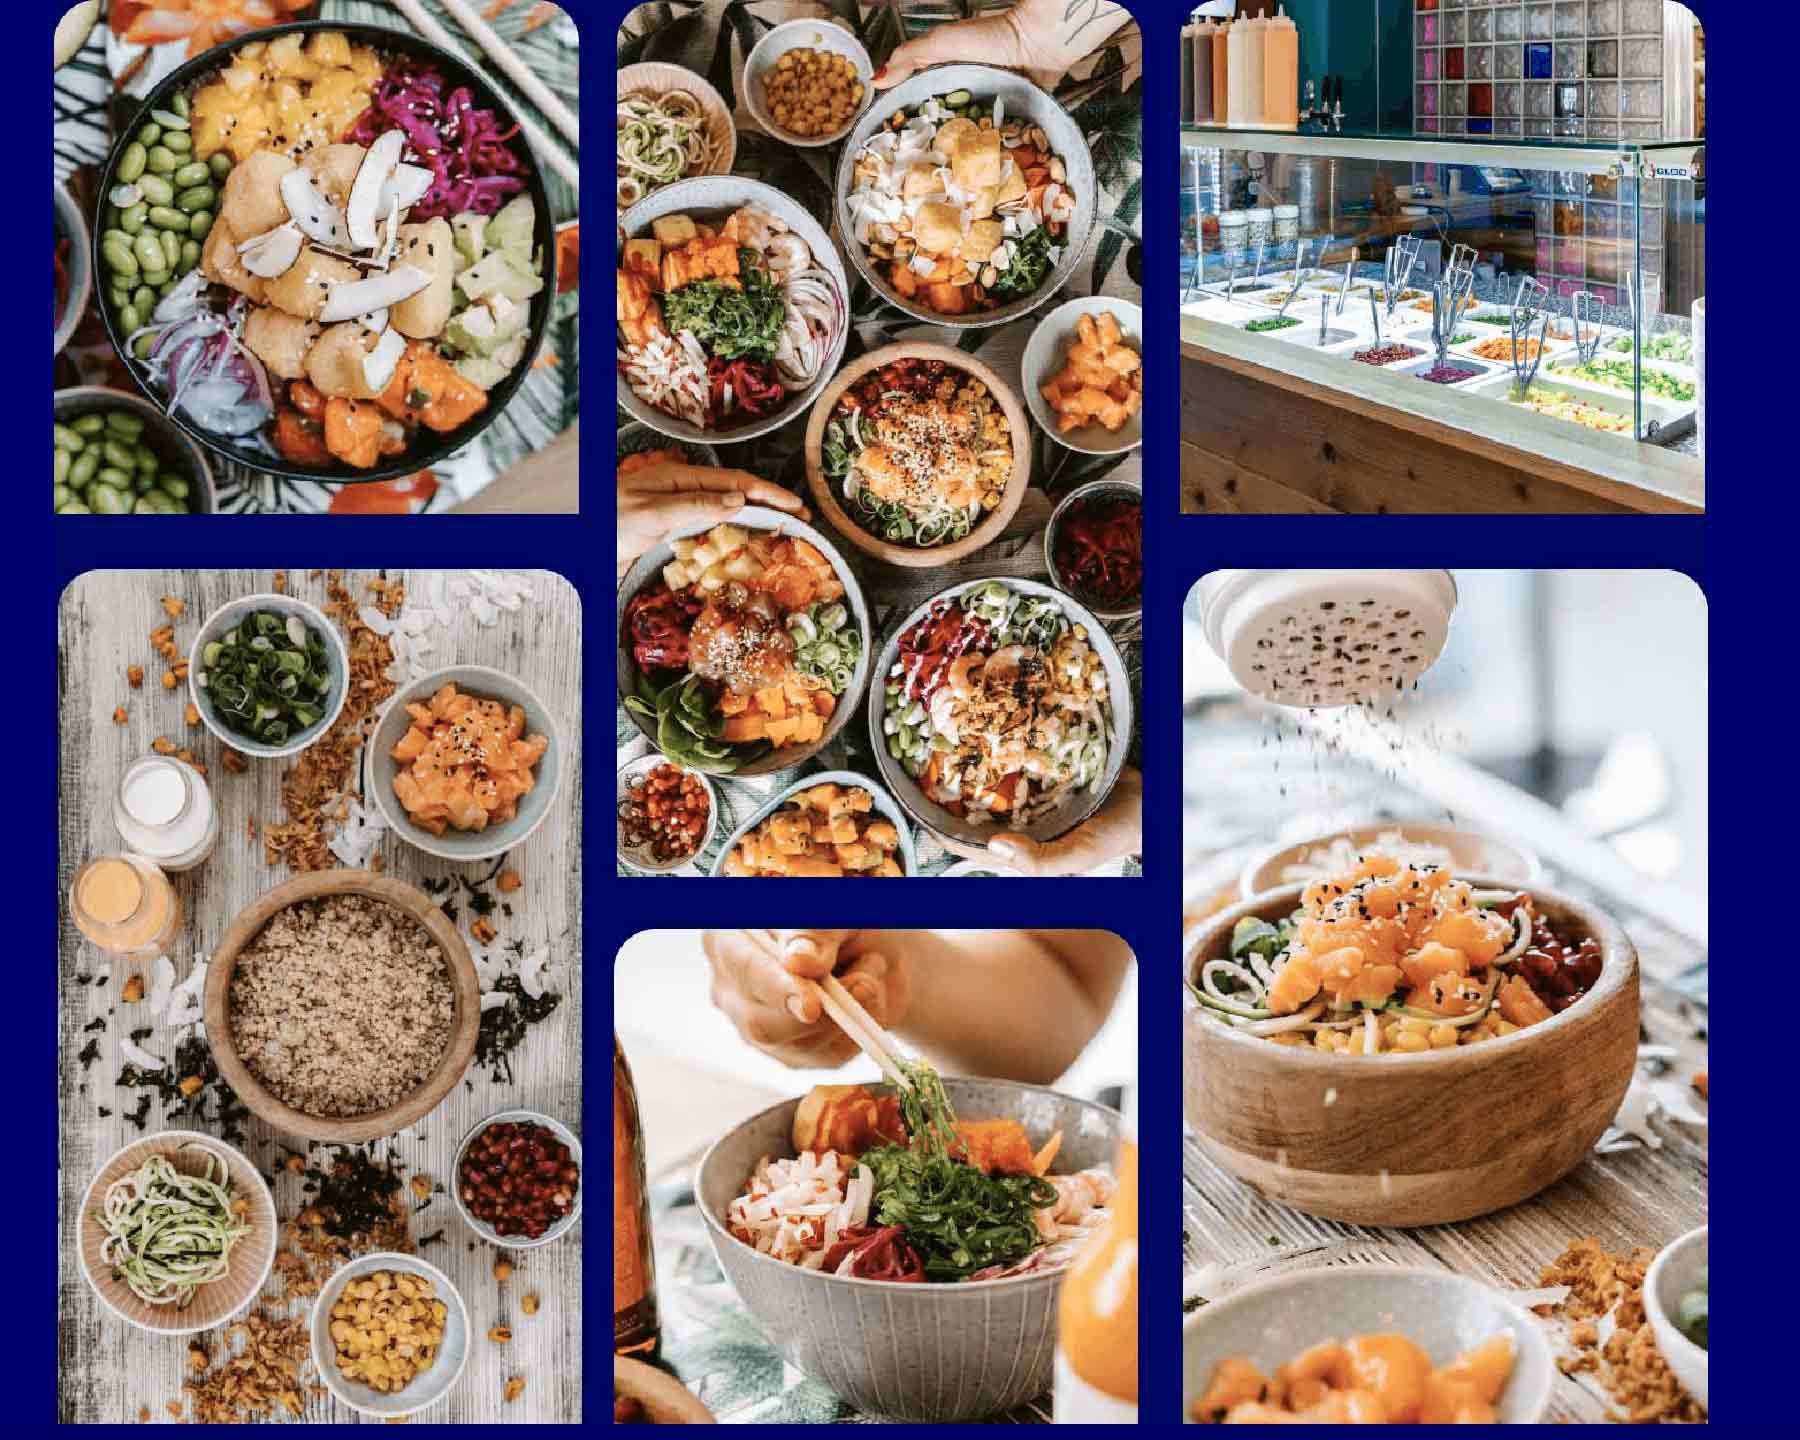 Professionelle Food Fotos im Instagram Feed.